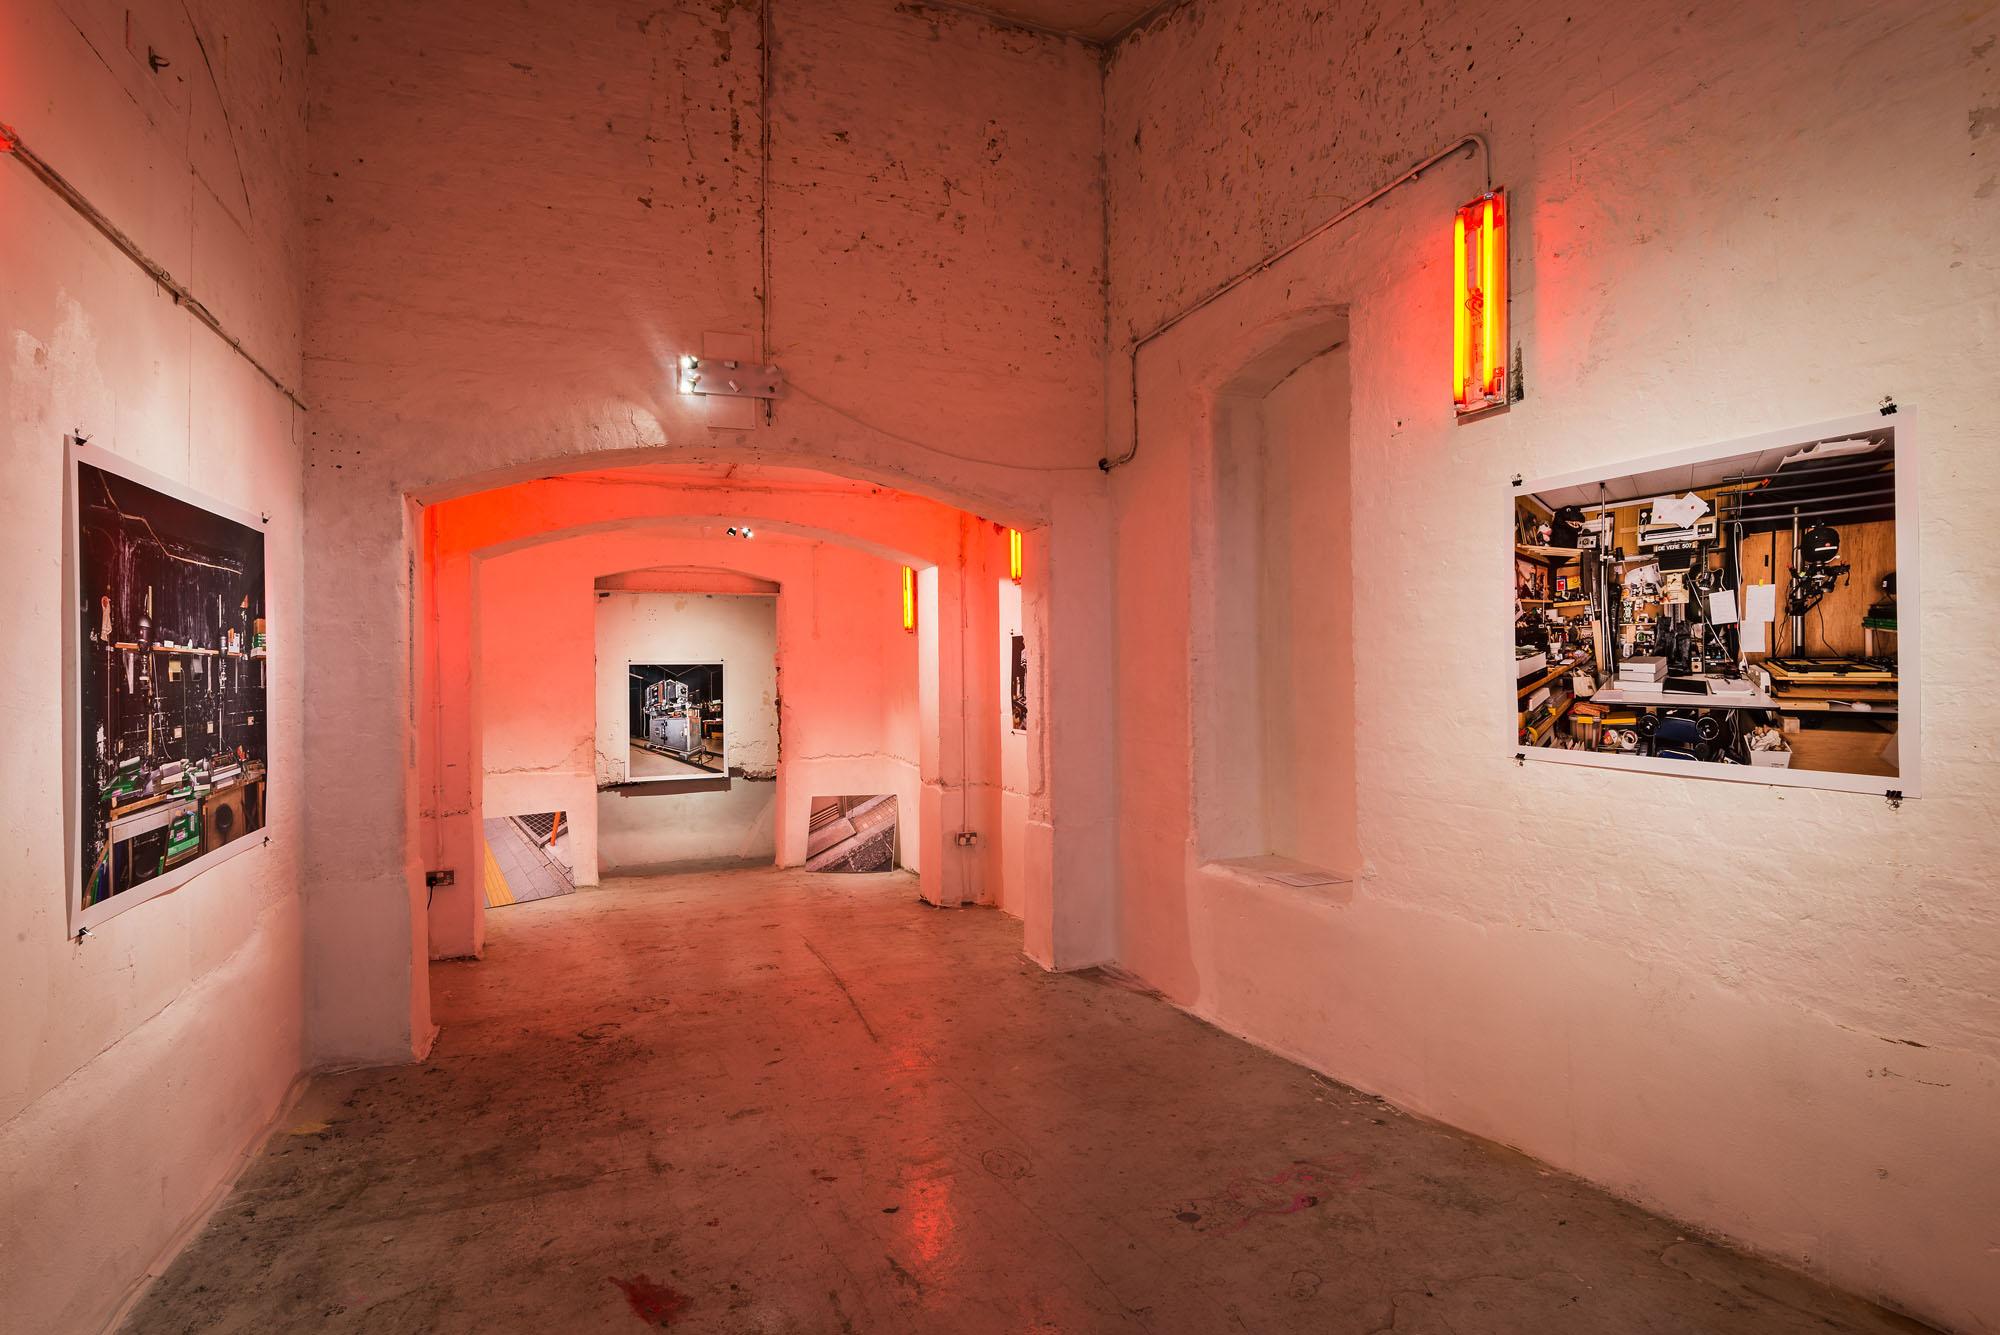 The morgue space exhibition